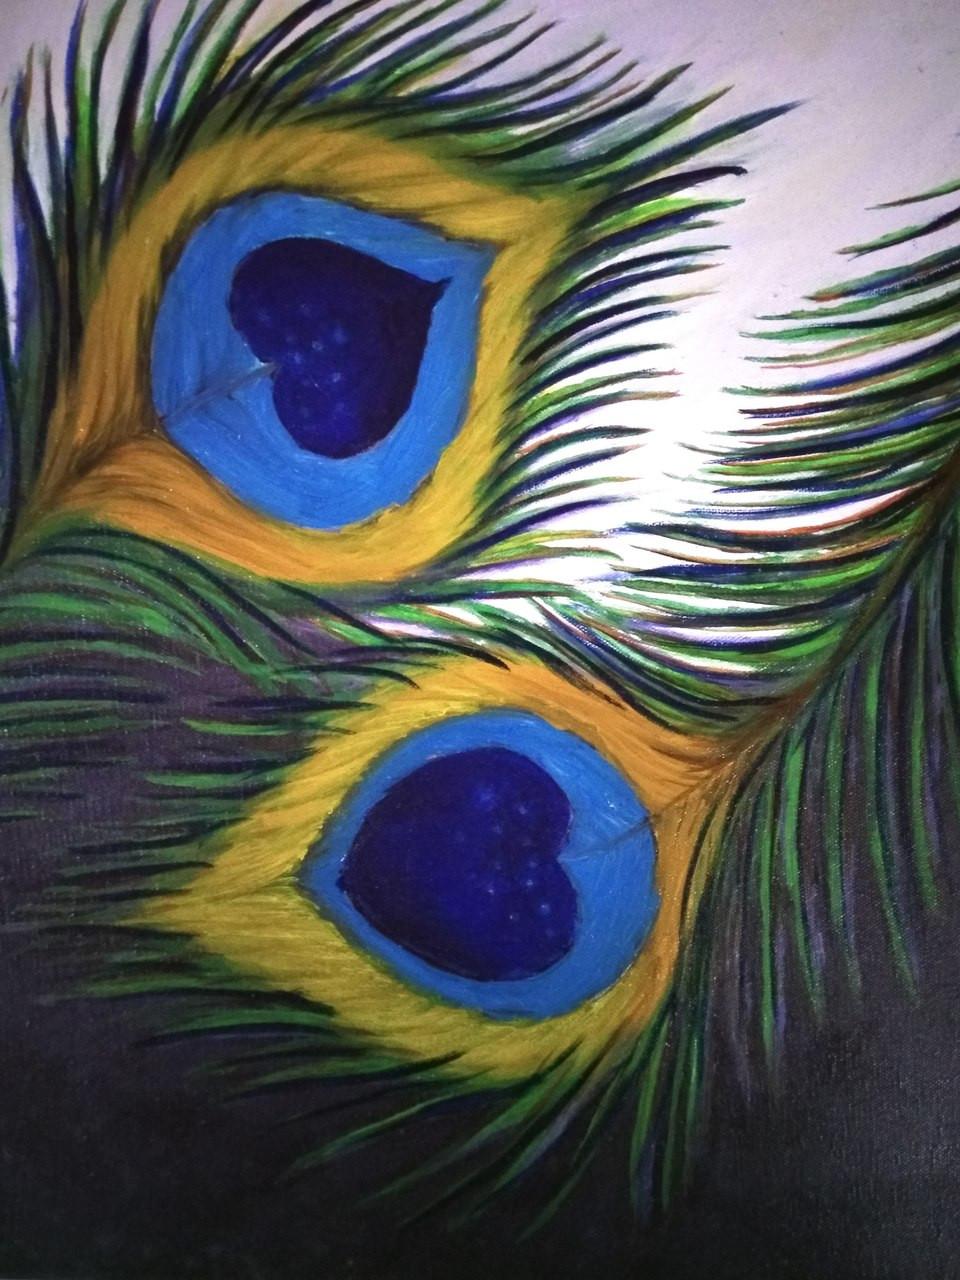 Buy Peacock Feather Handmade Painting By Saish Kalangutkar